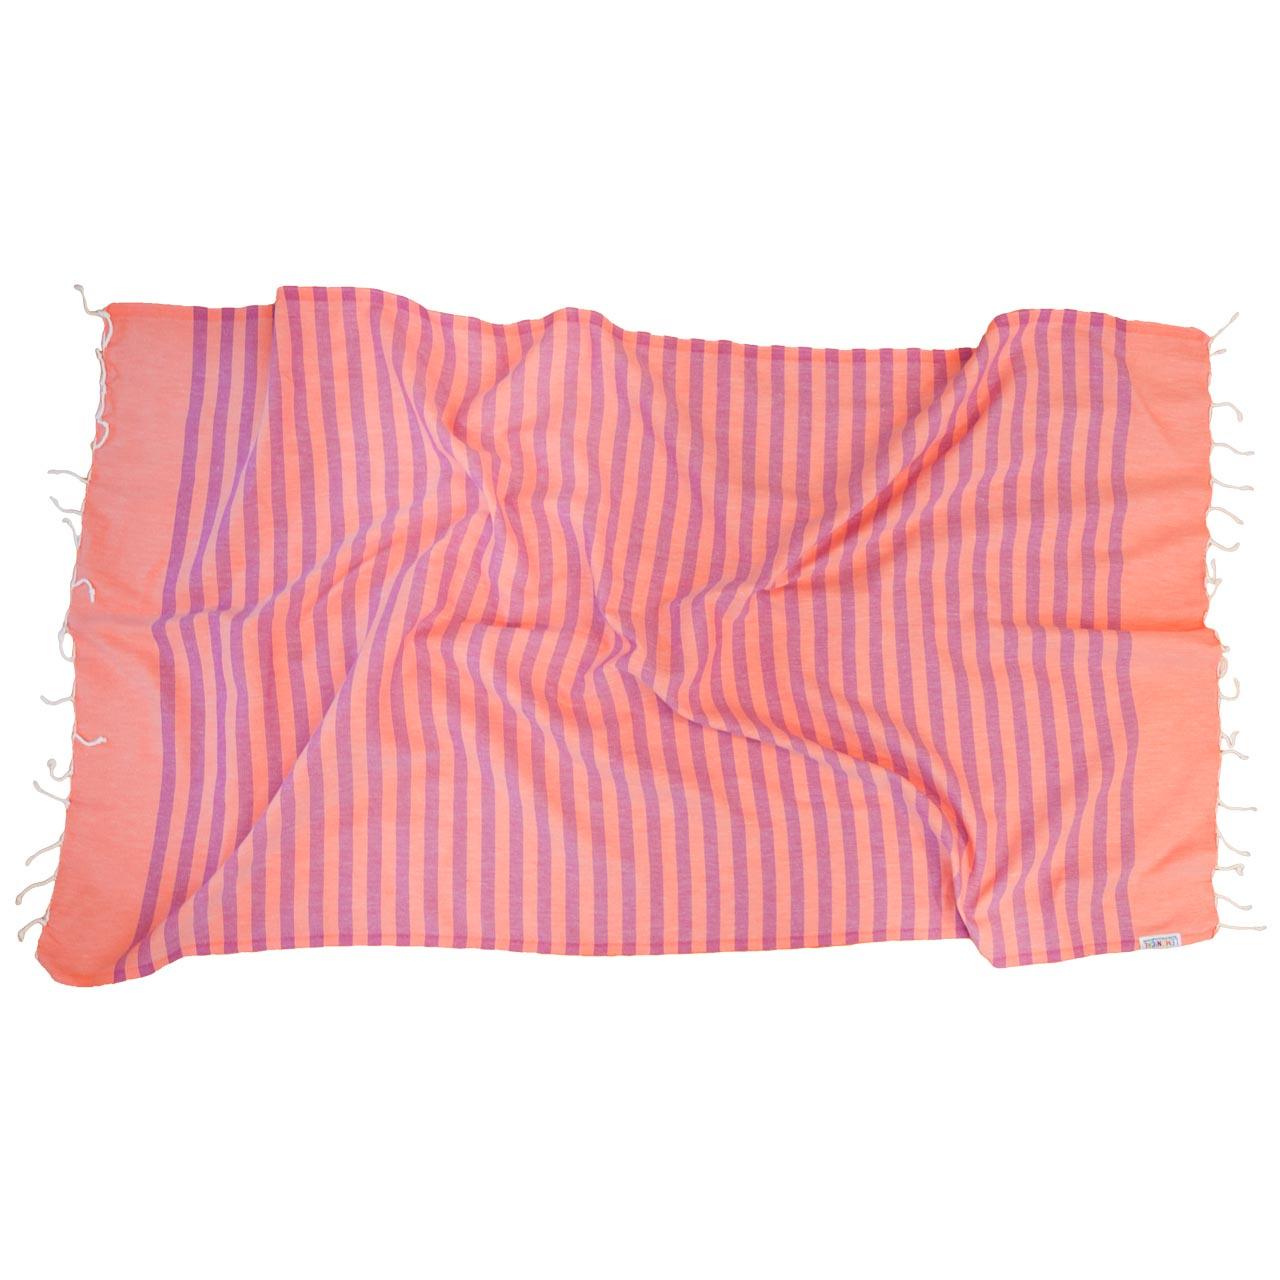 SUNSET MOJITO BEACH TOWEL